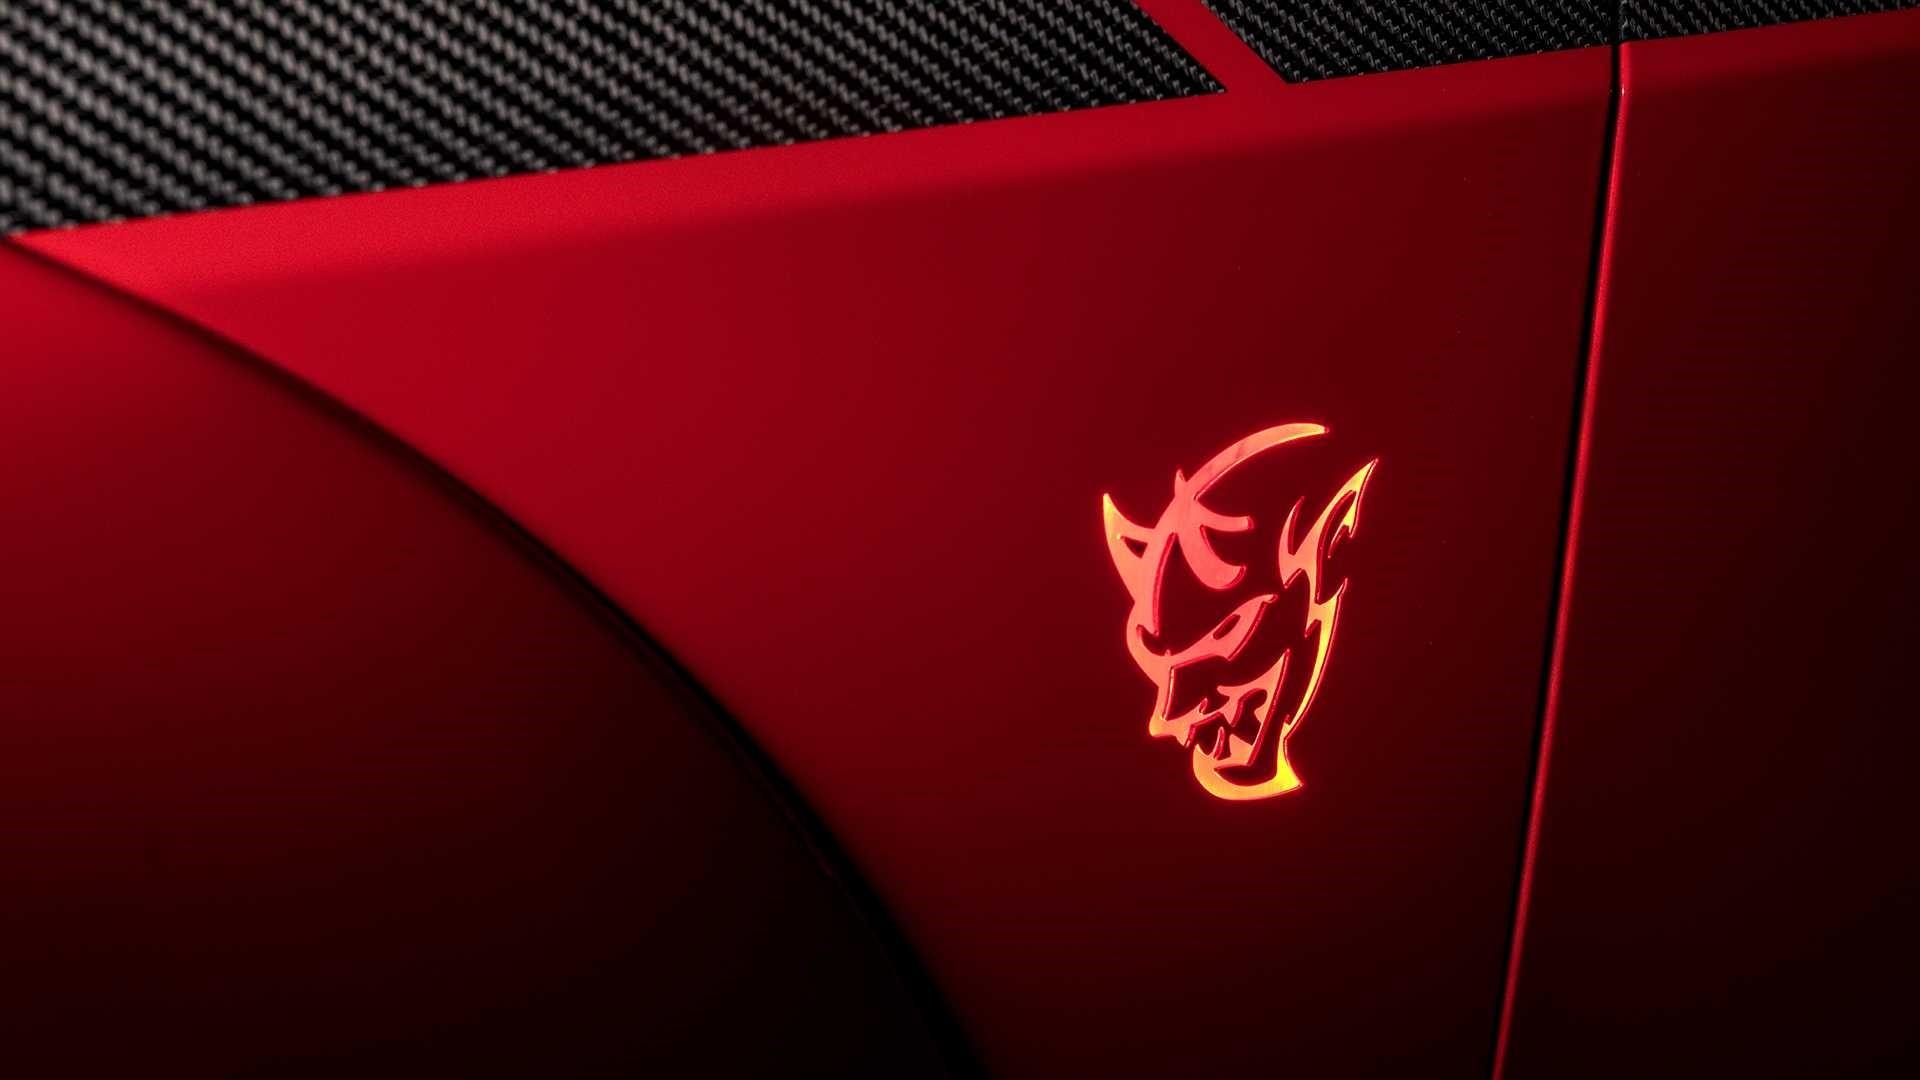 Dodge Demon Logo Wallpaper Picture hd